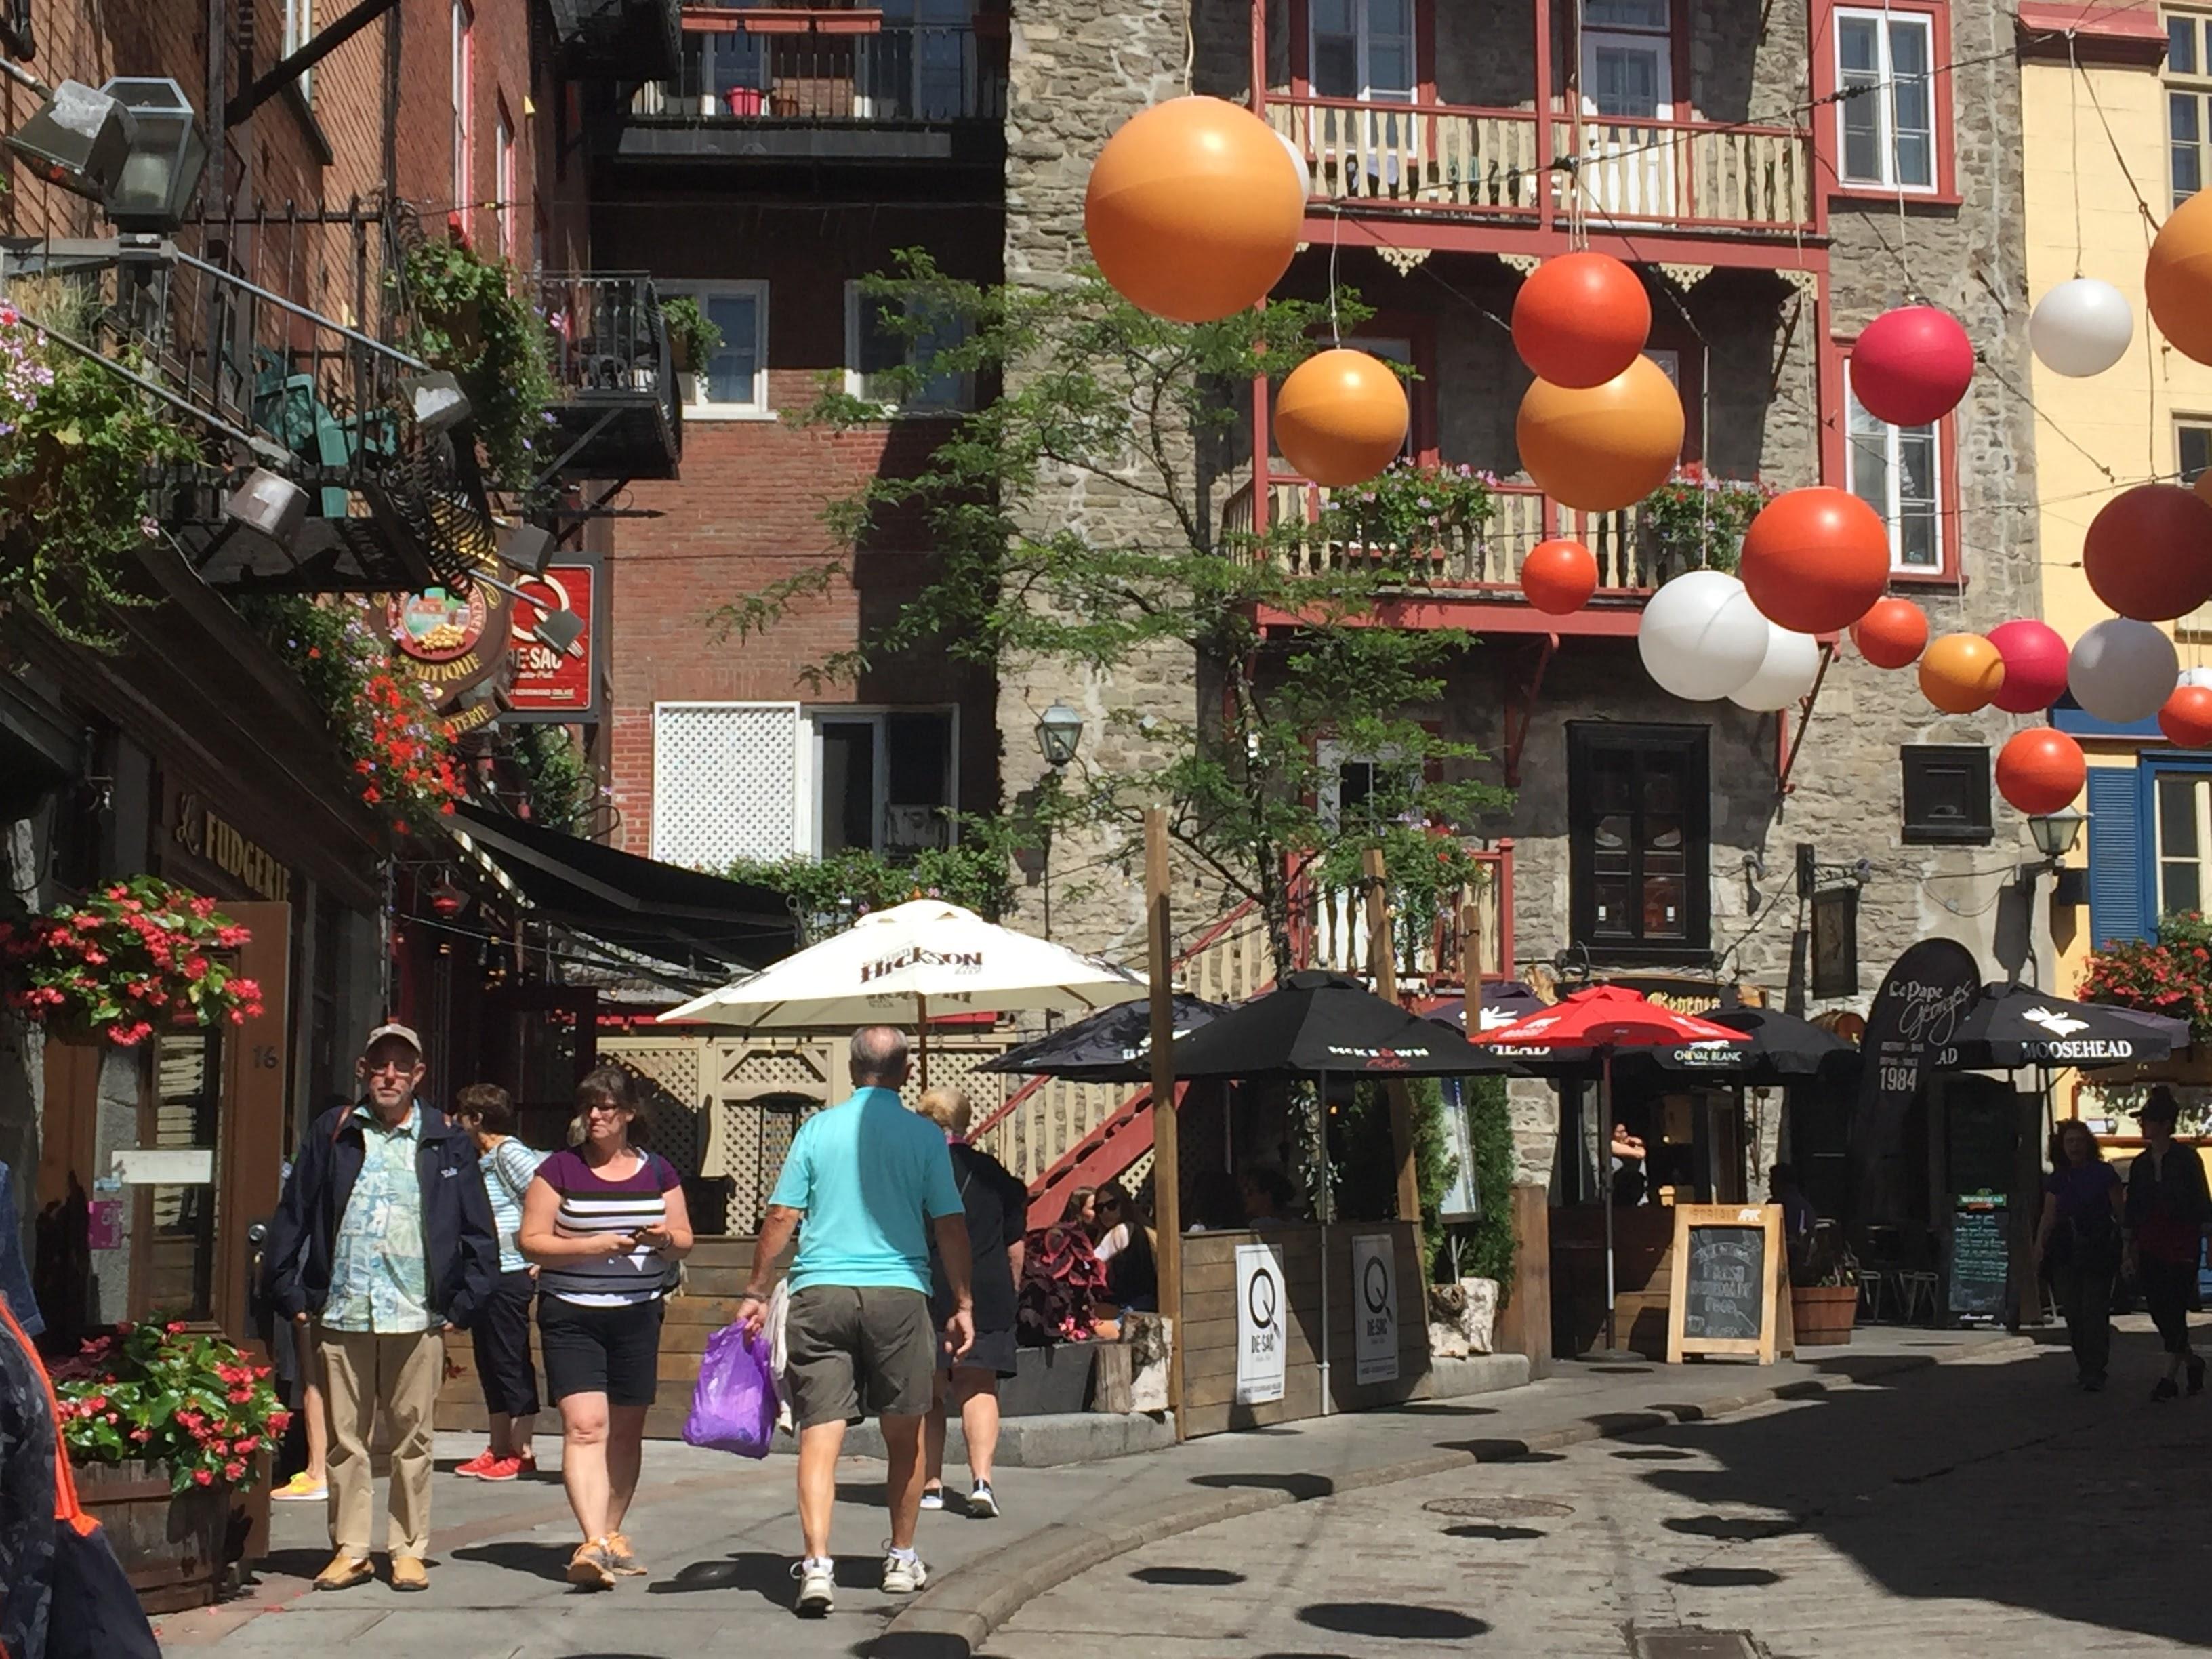 2017-08-17 Quebec City 34